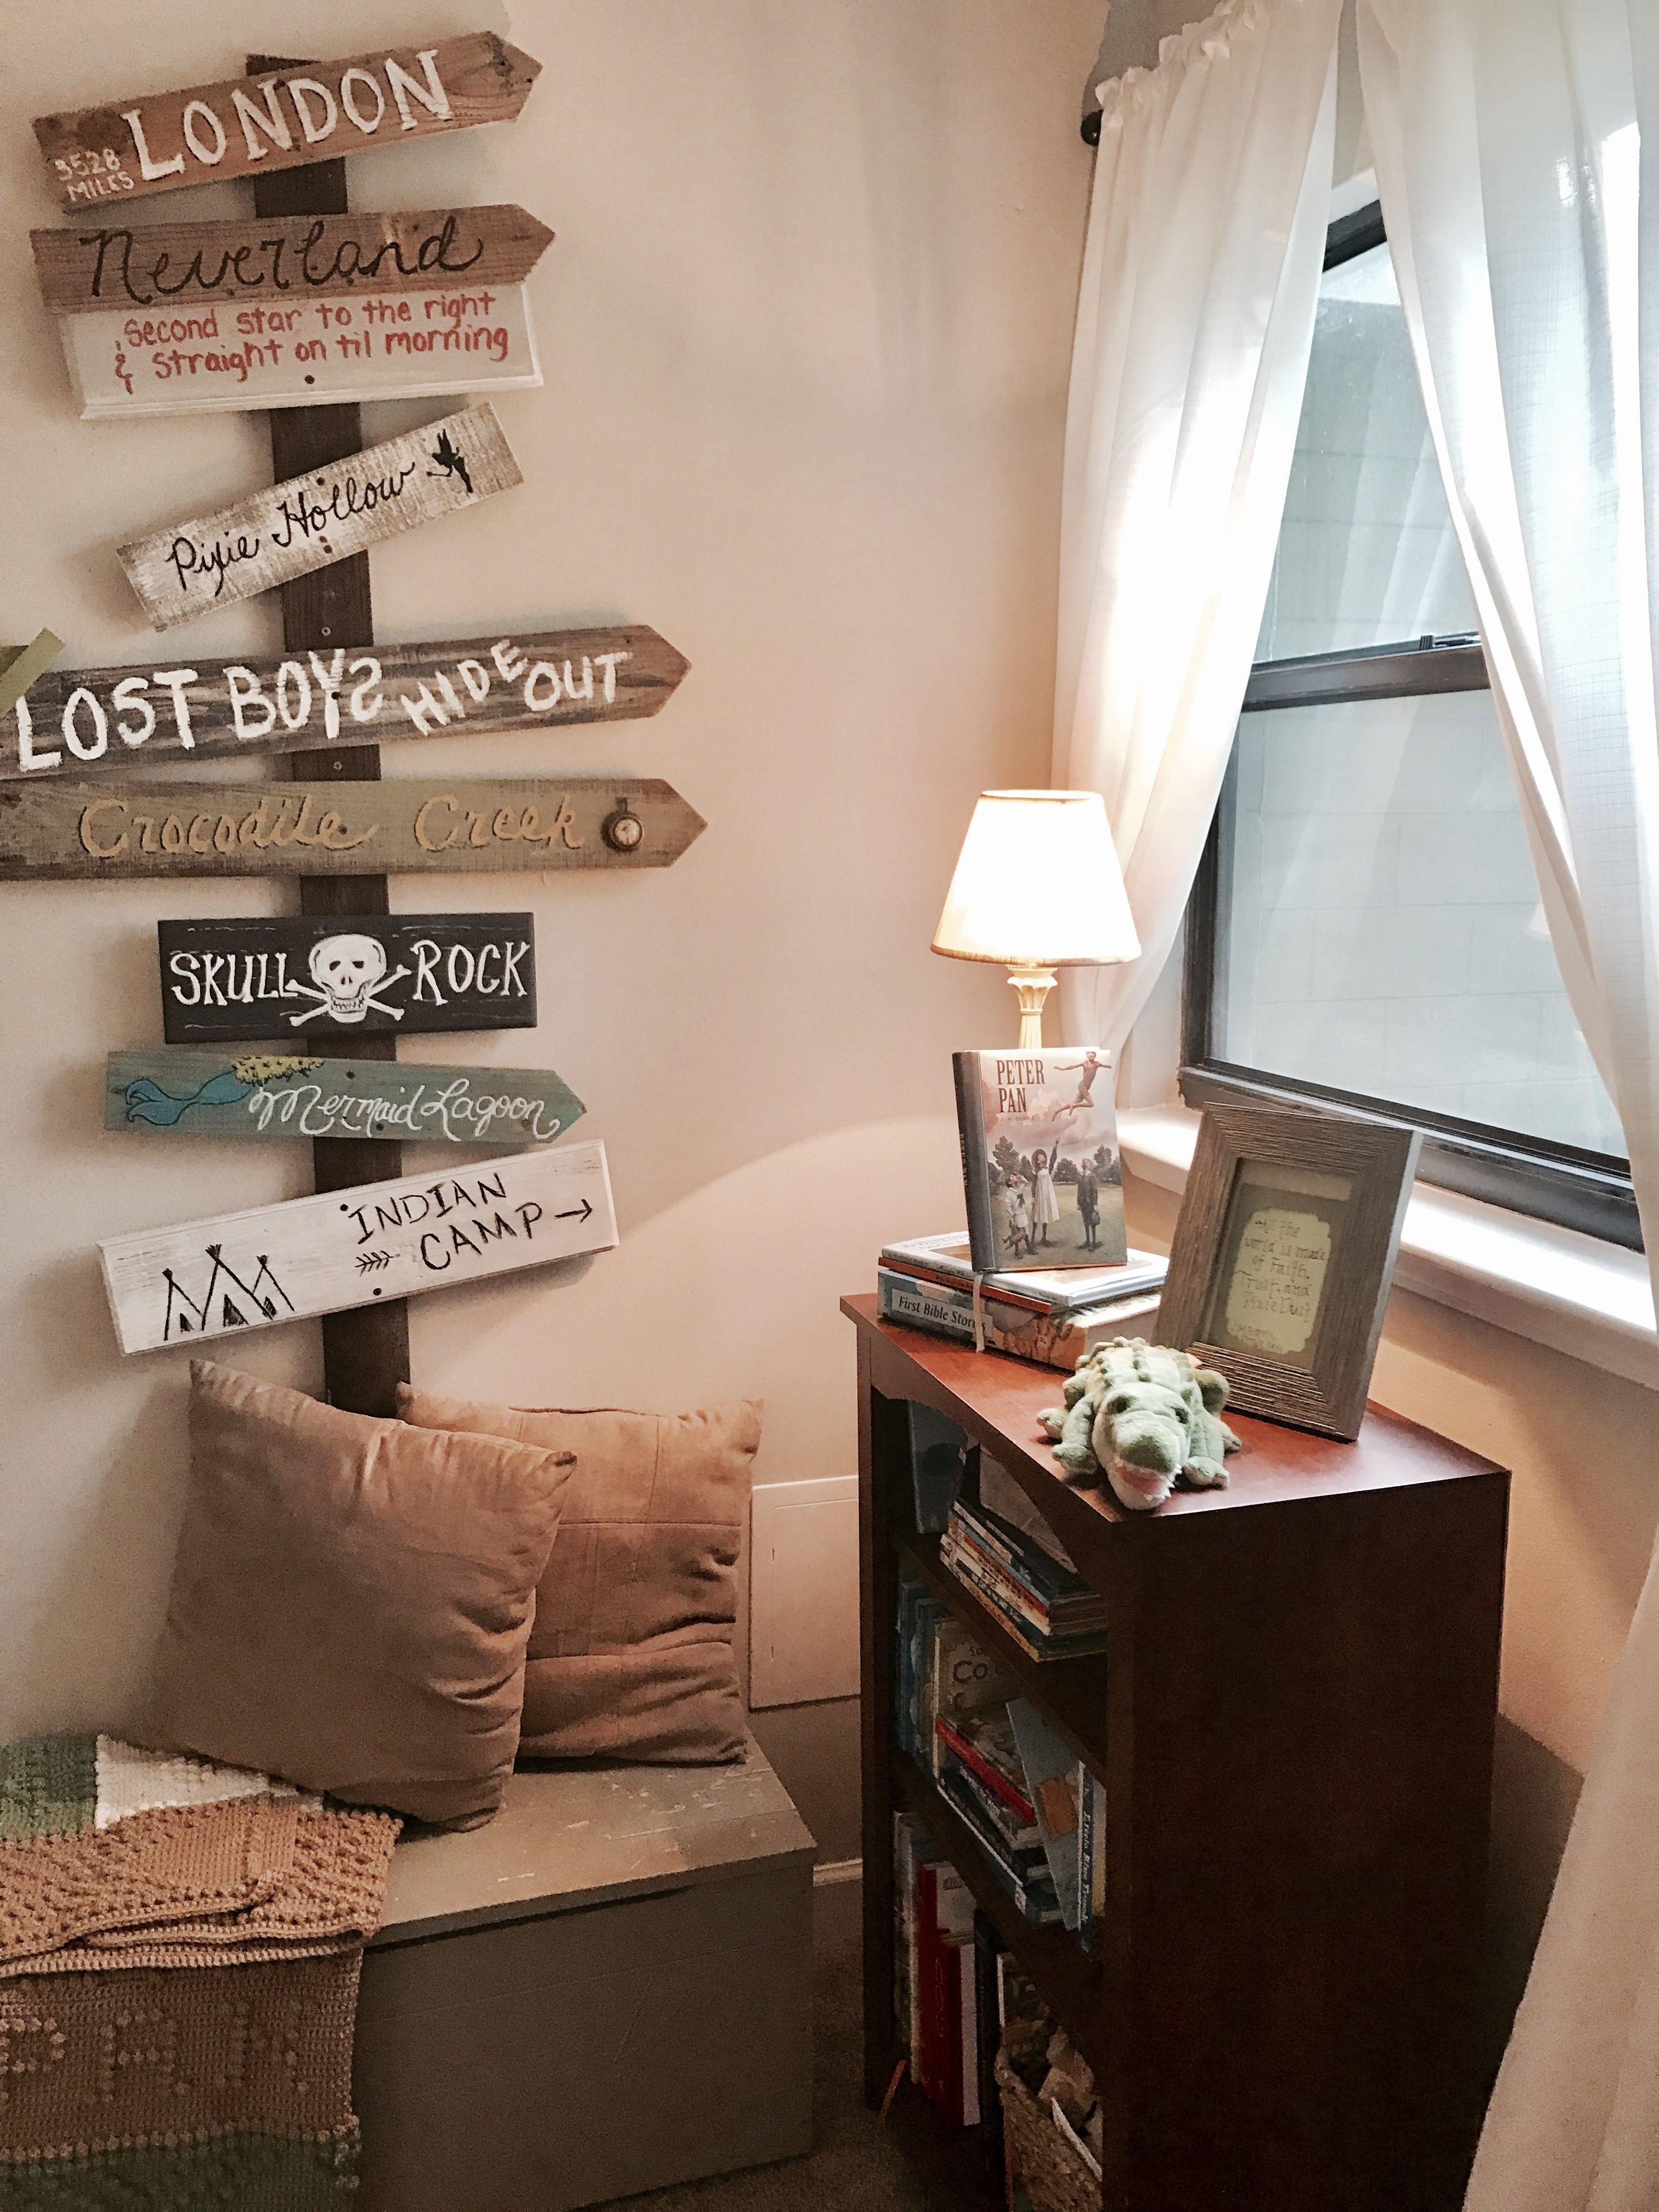 Bookshelf And Directional Wall Decor For Peter Pan Bedroom